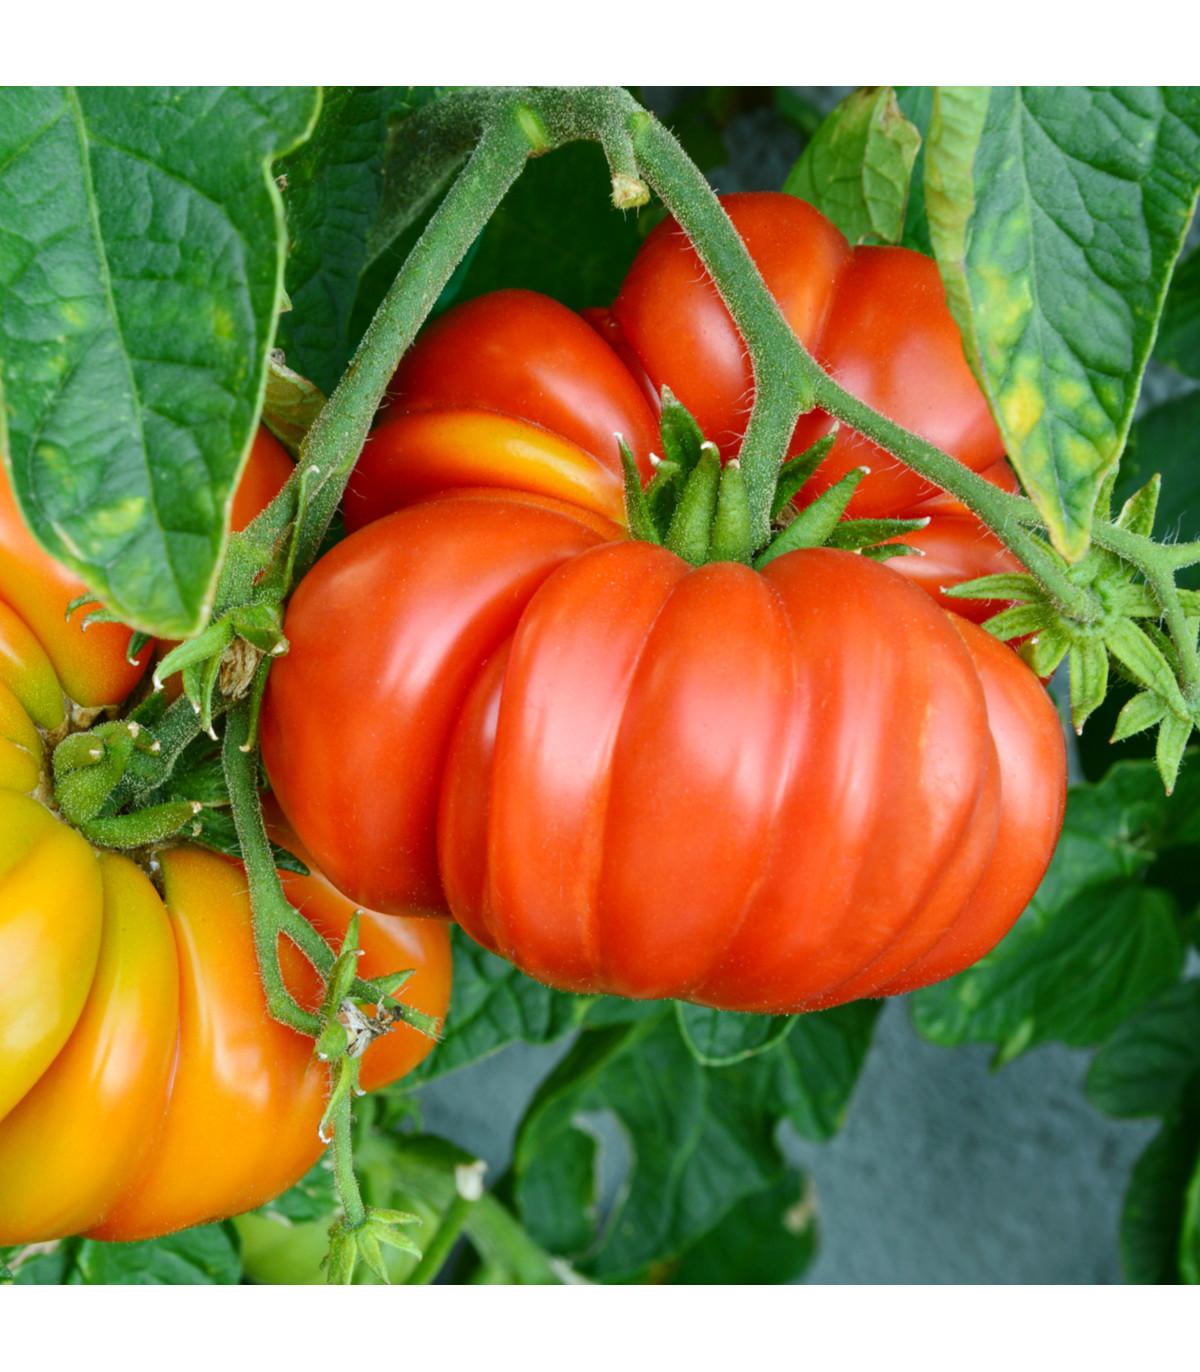 Rajče Brandywine červené - Solanum lycopersicum - semena - 7 ks